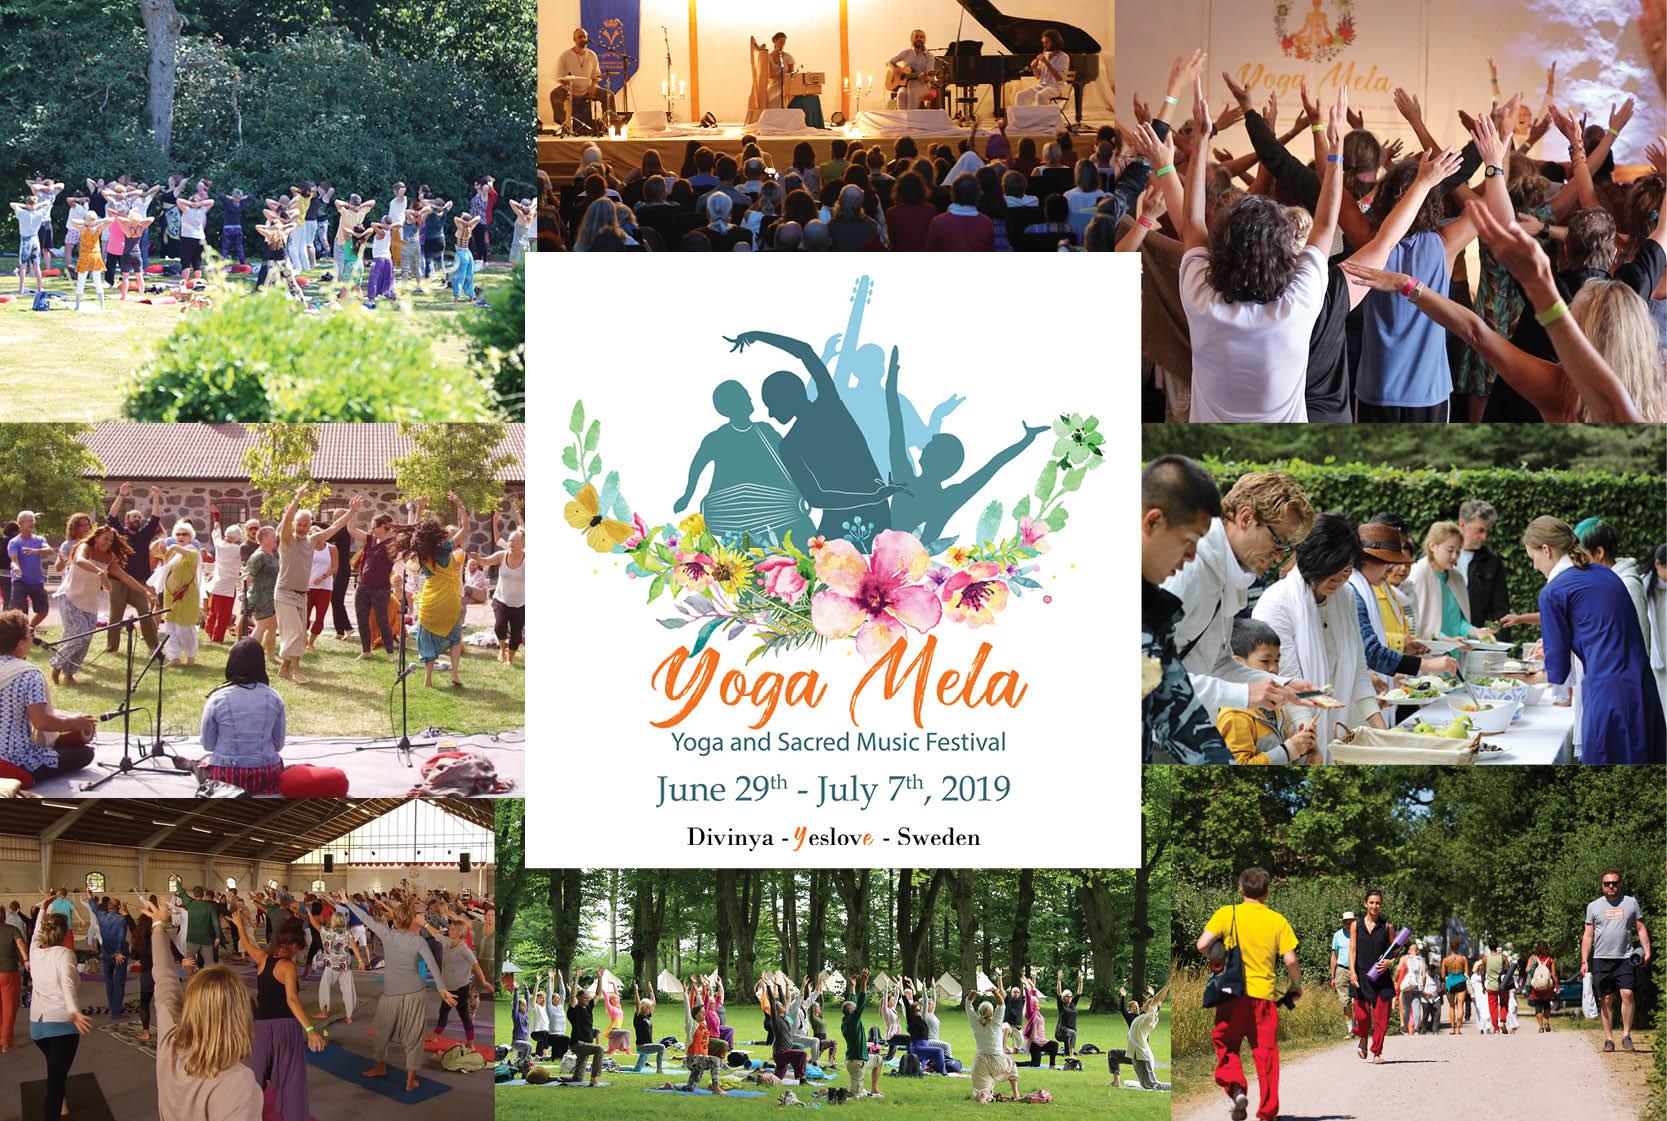 Yoga Mela Festival 2019